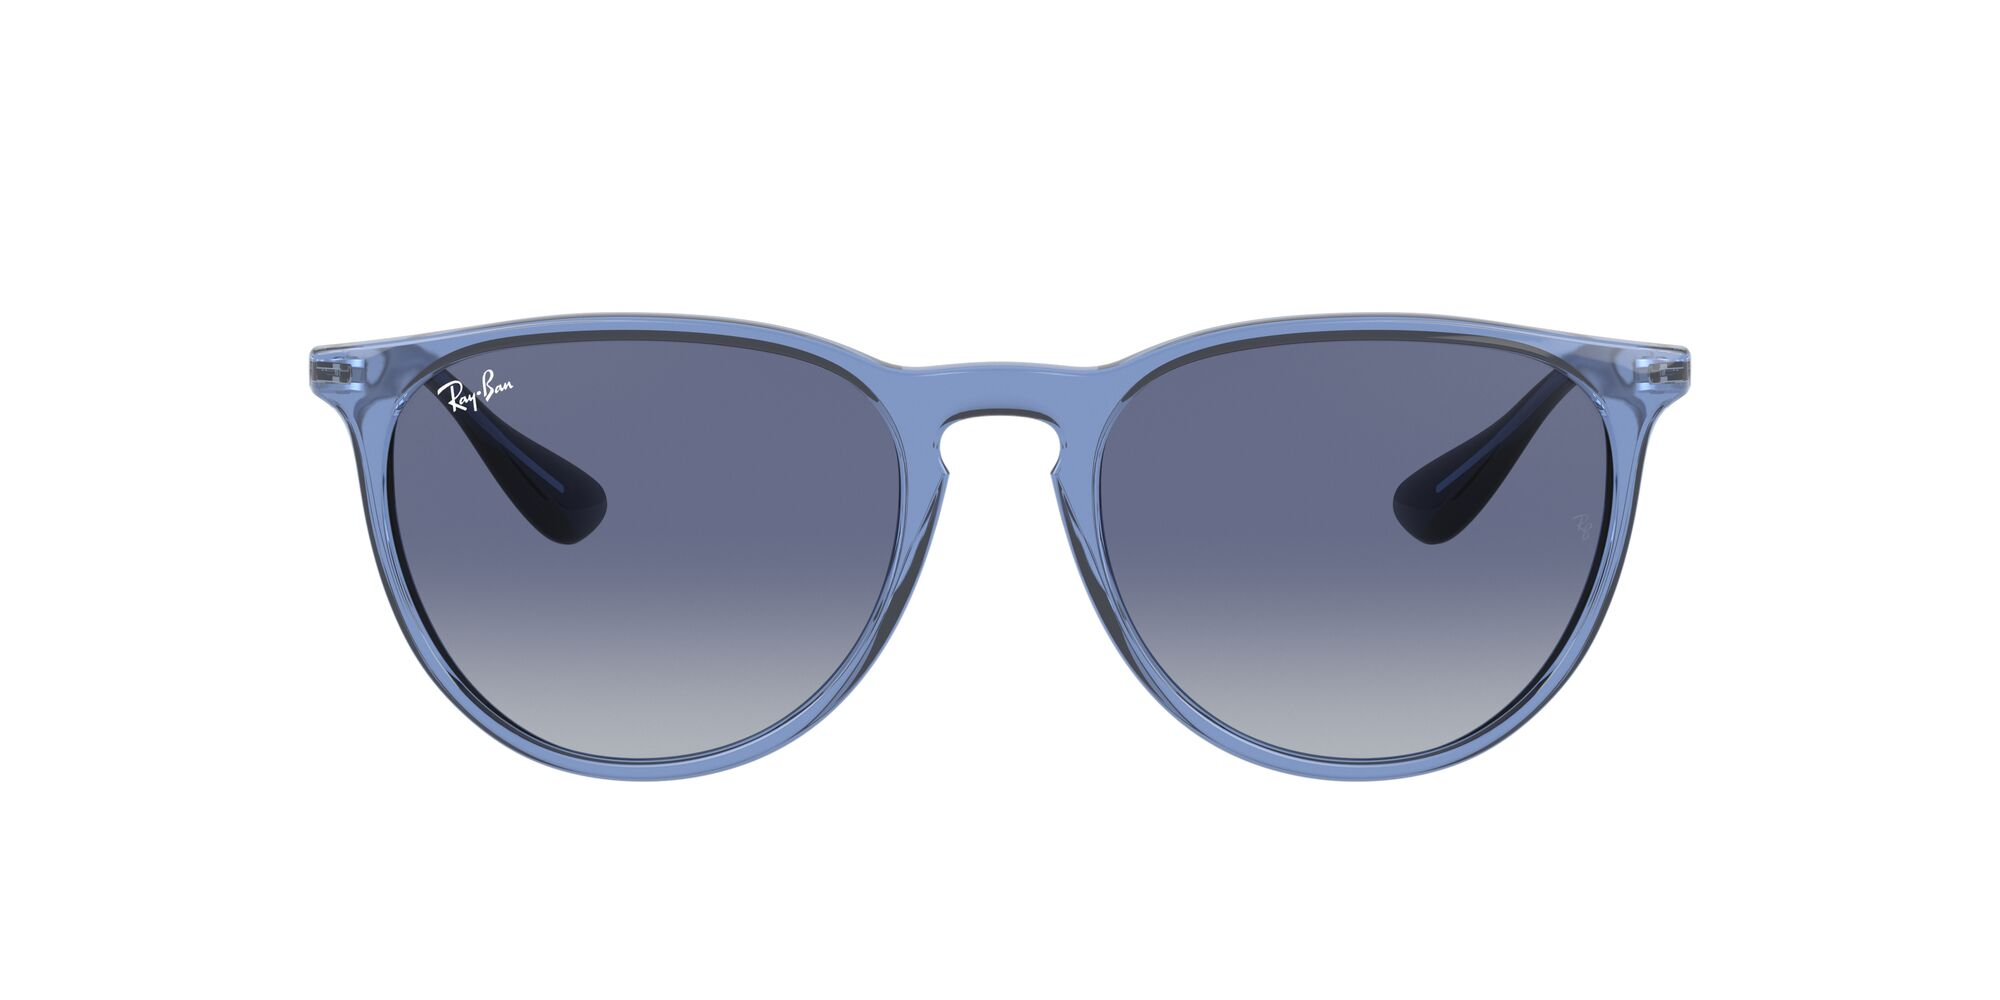 Front Ray-Ban Ray-Ban 0RB4171 65154L 54/18 Transparant, Blauw/Blauw